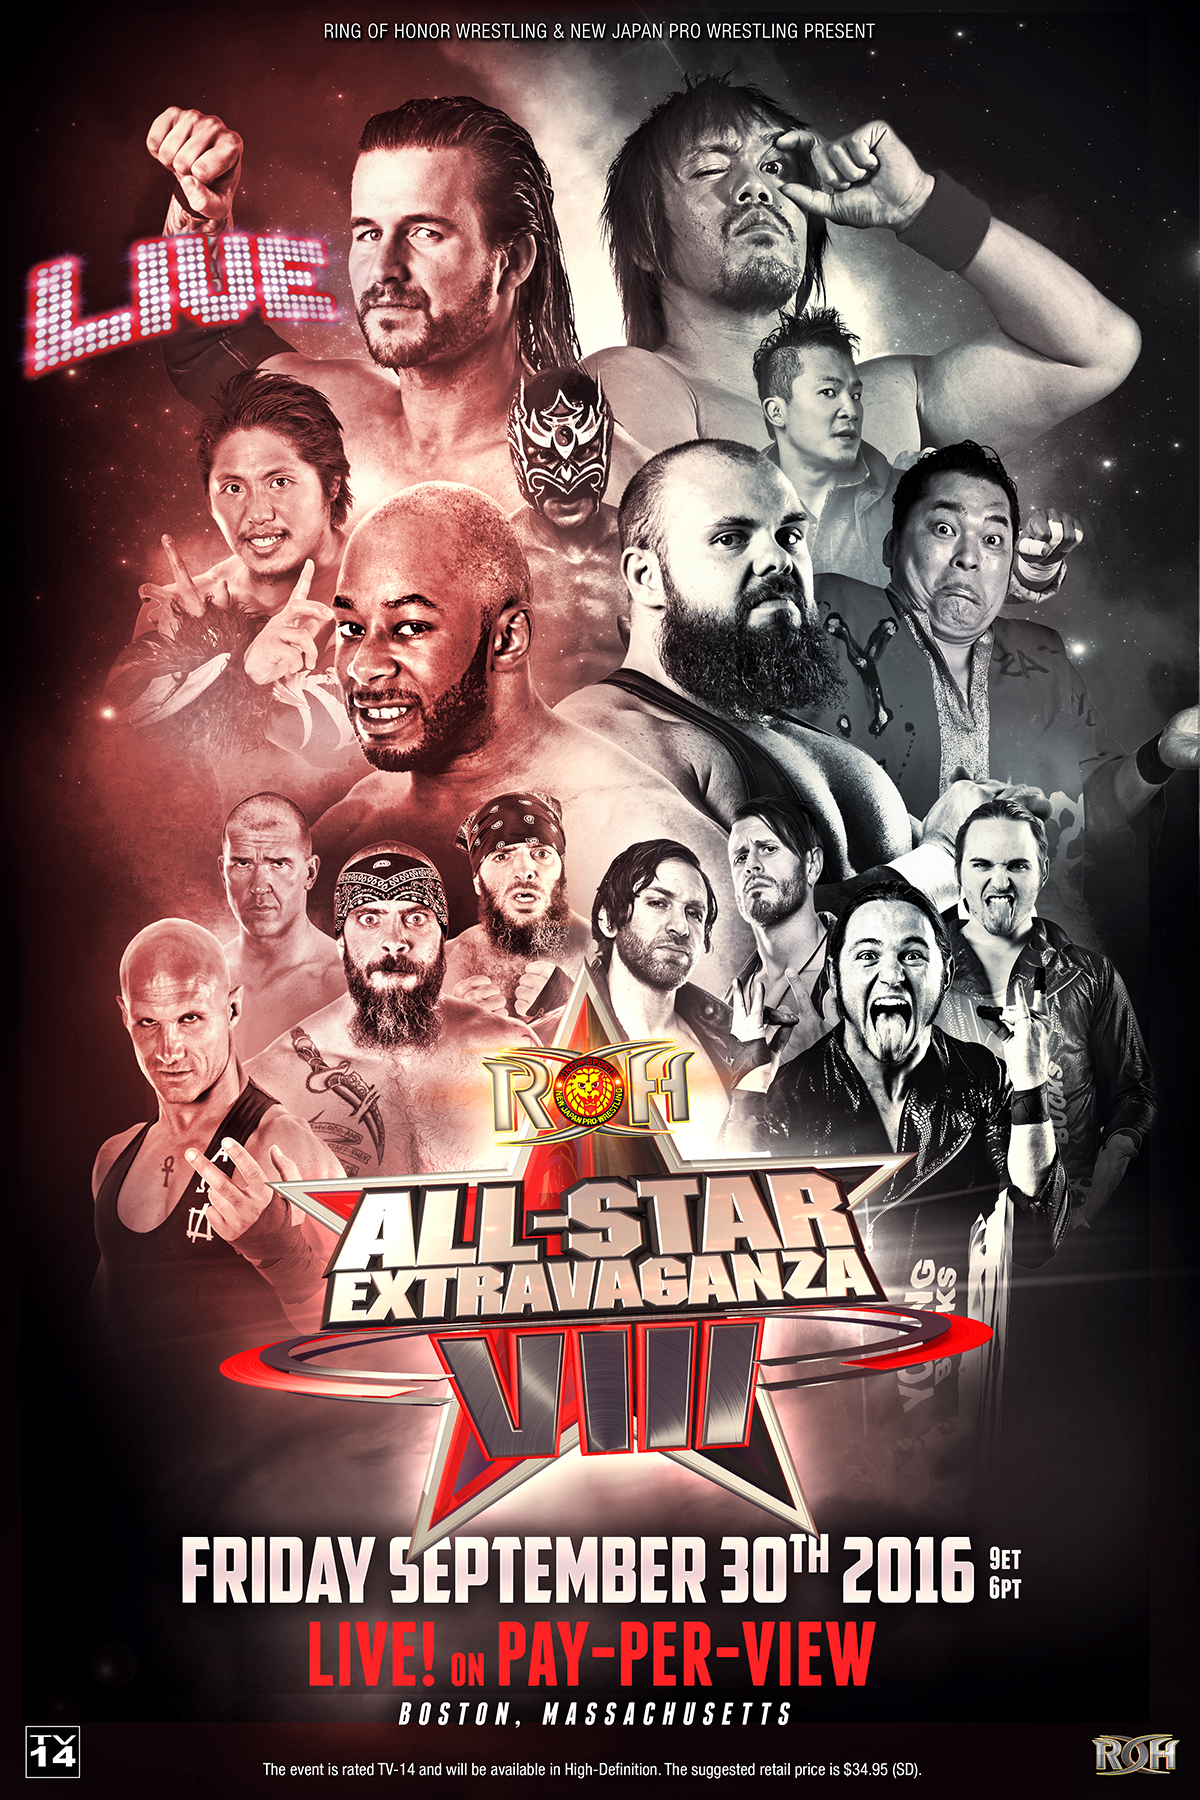 ROH All Star Extravaganza 2016